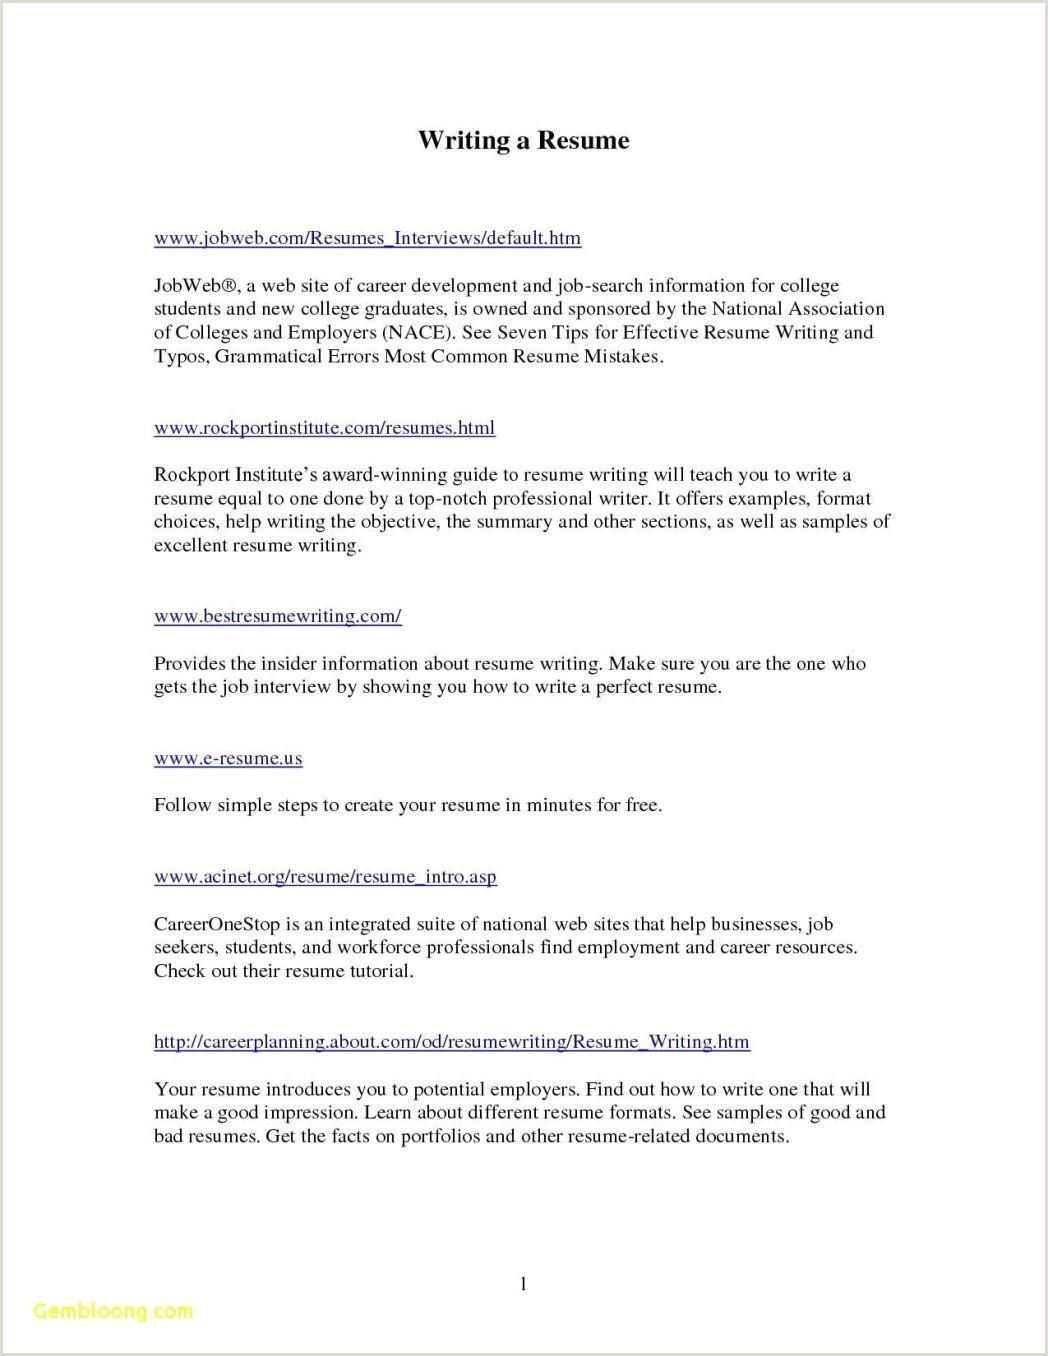 Cover Letter For New Career Sample Application Covering